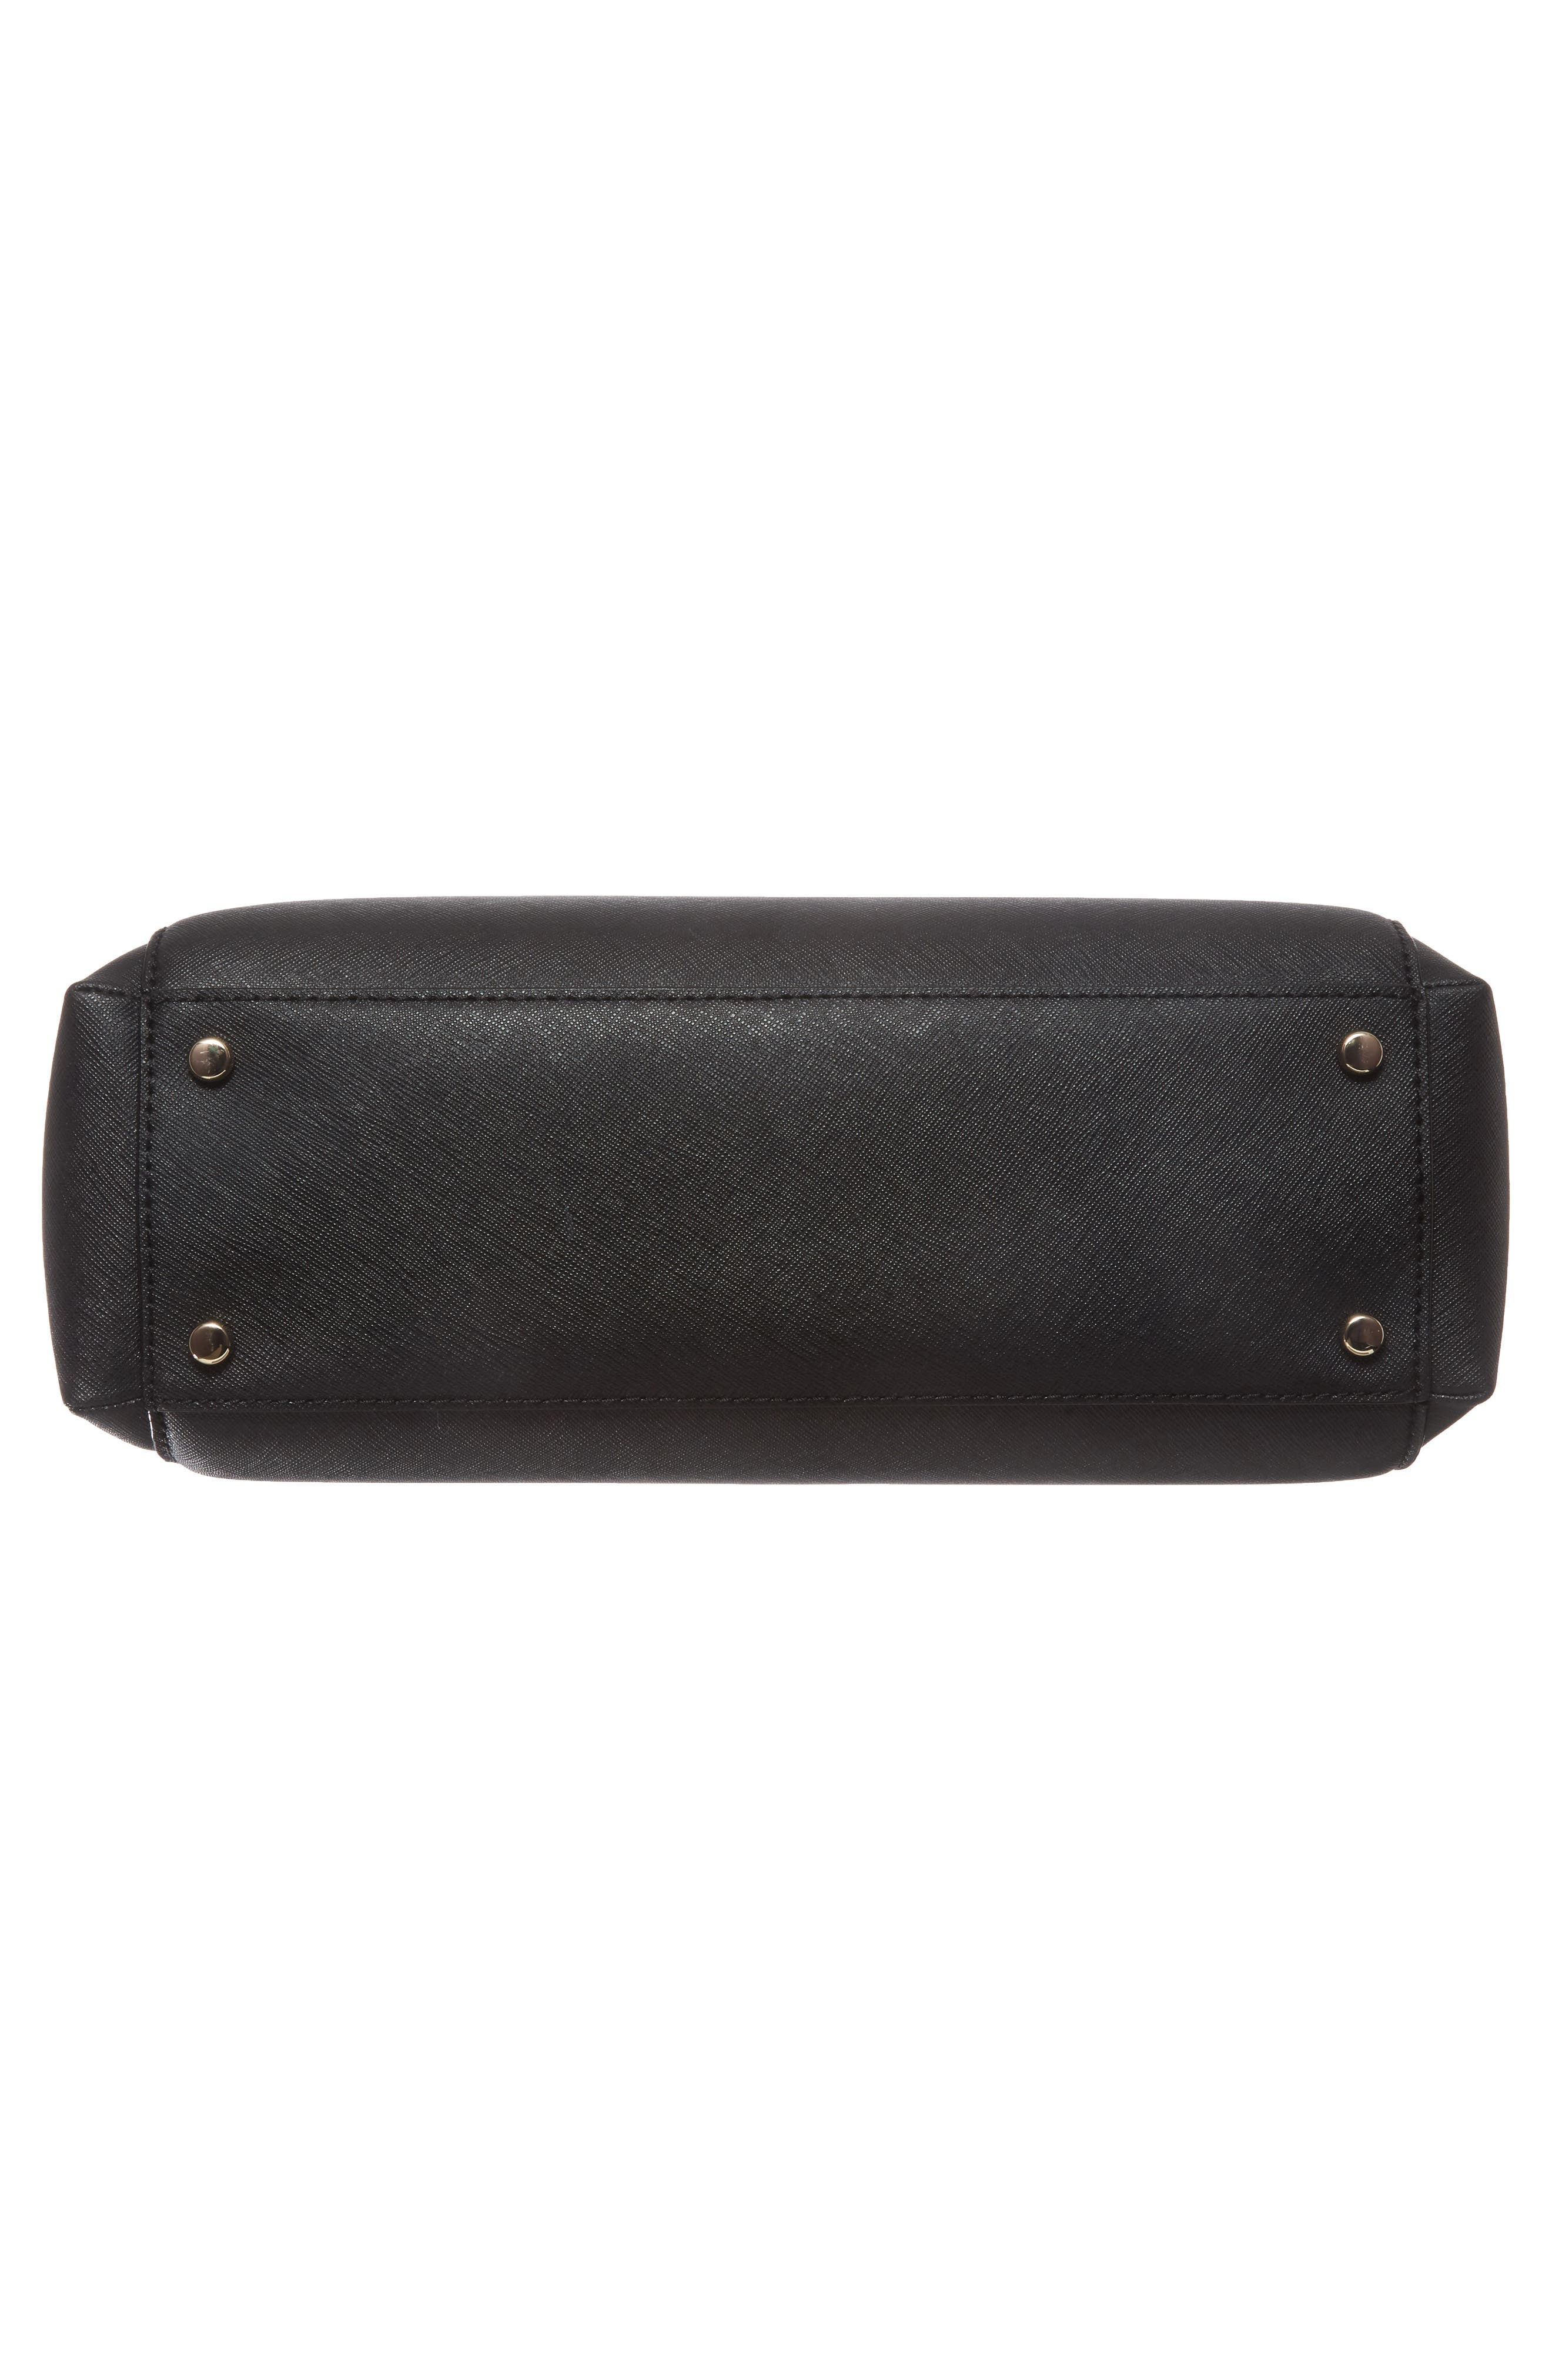 cameron street - teegan calfskin leather satchel,                             Alternate thumbnail 6, color,                             Black